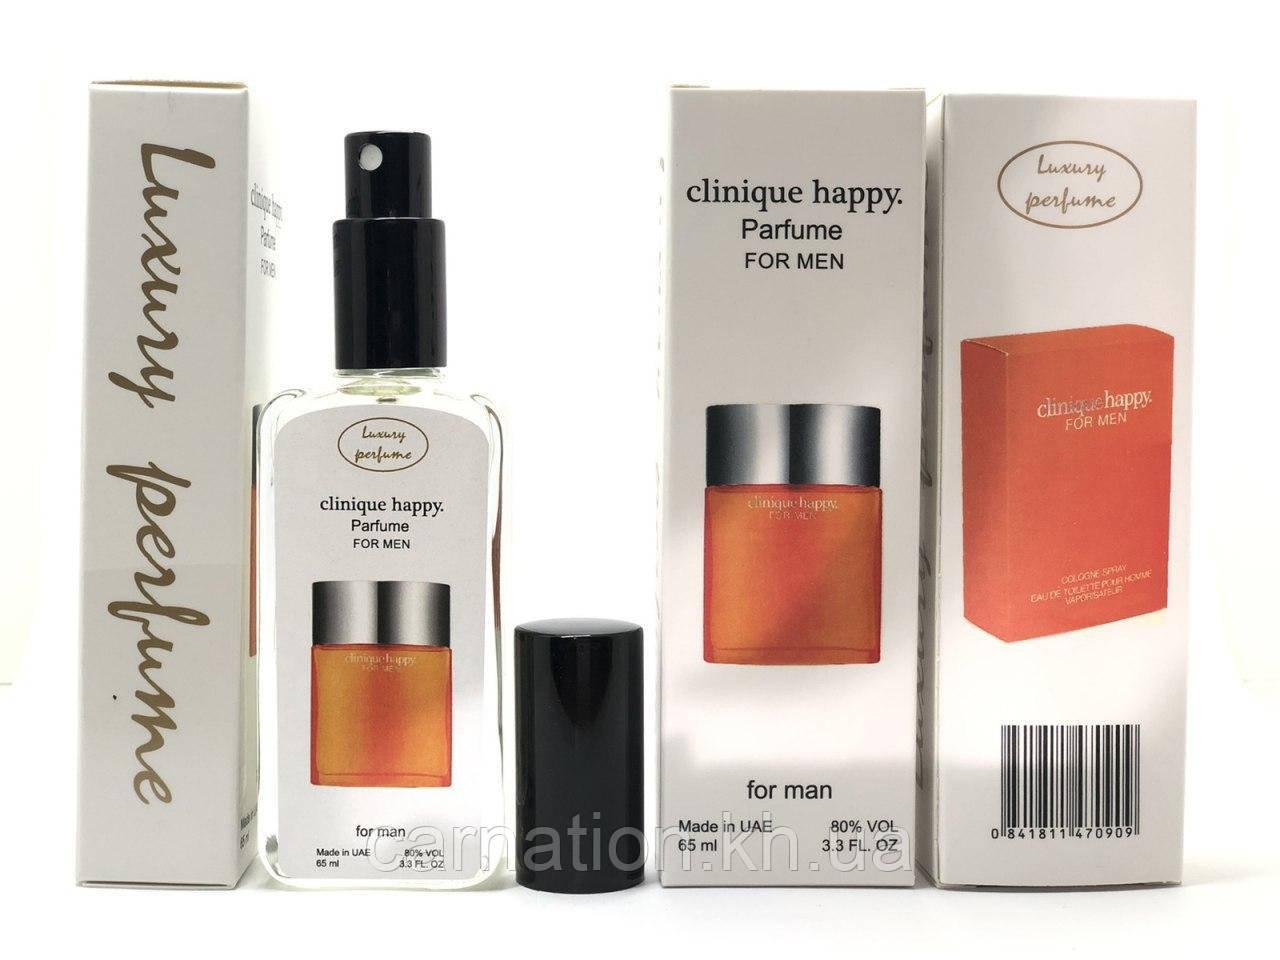 Мужской тестер Clinique Happy For Men Luxury Perfume (Клиник Хэппи) 65 мл